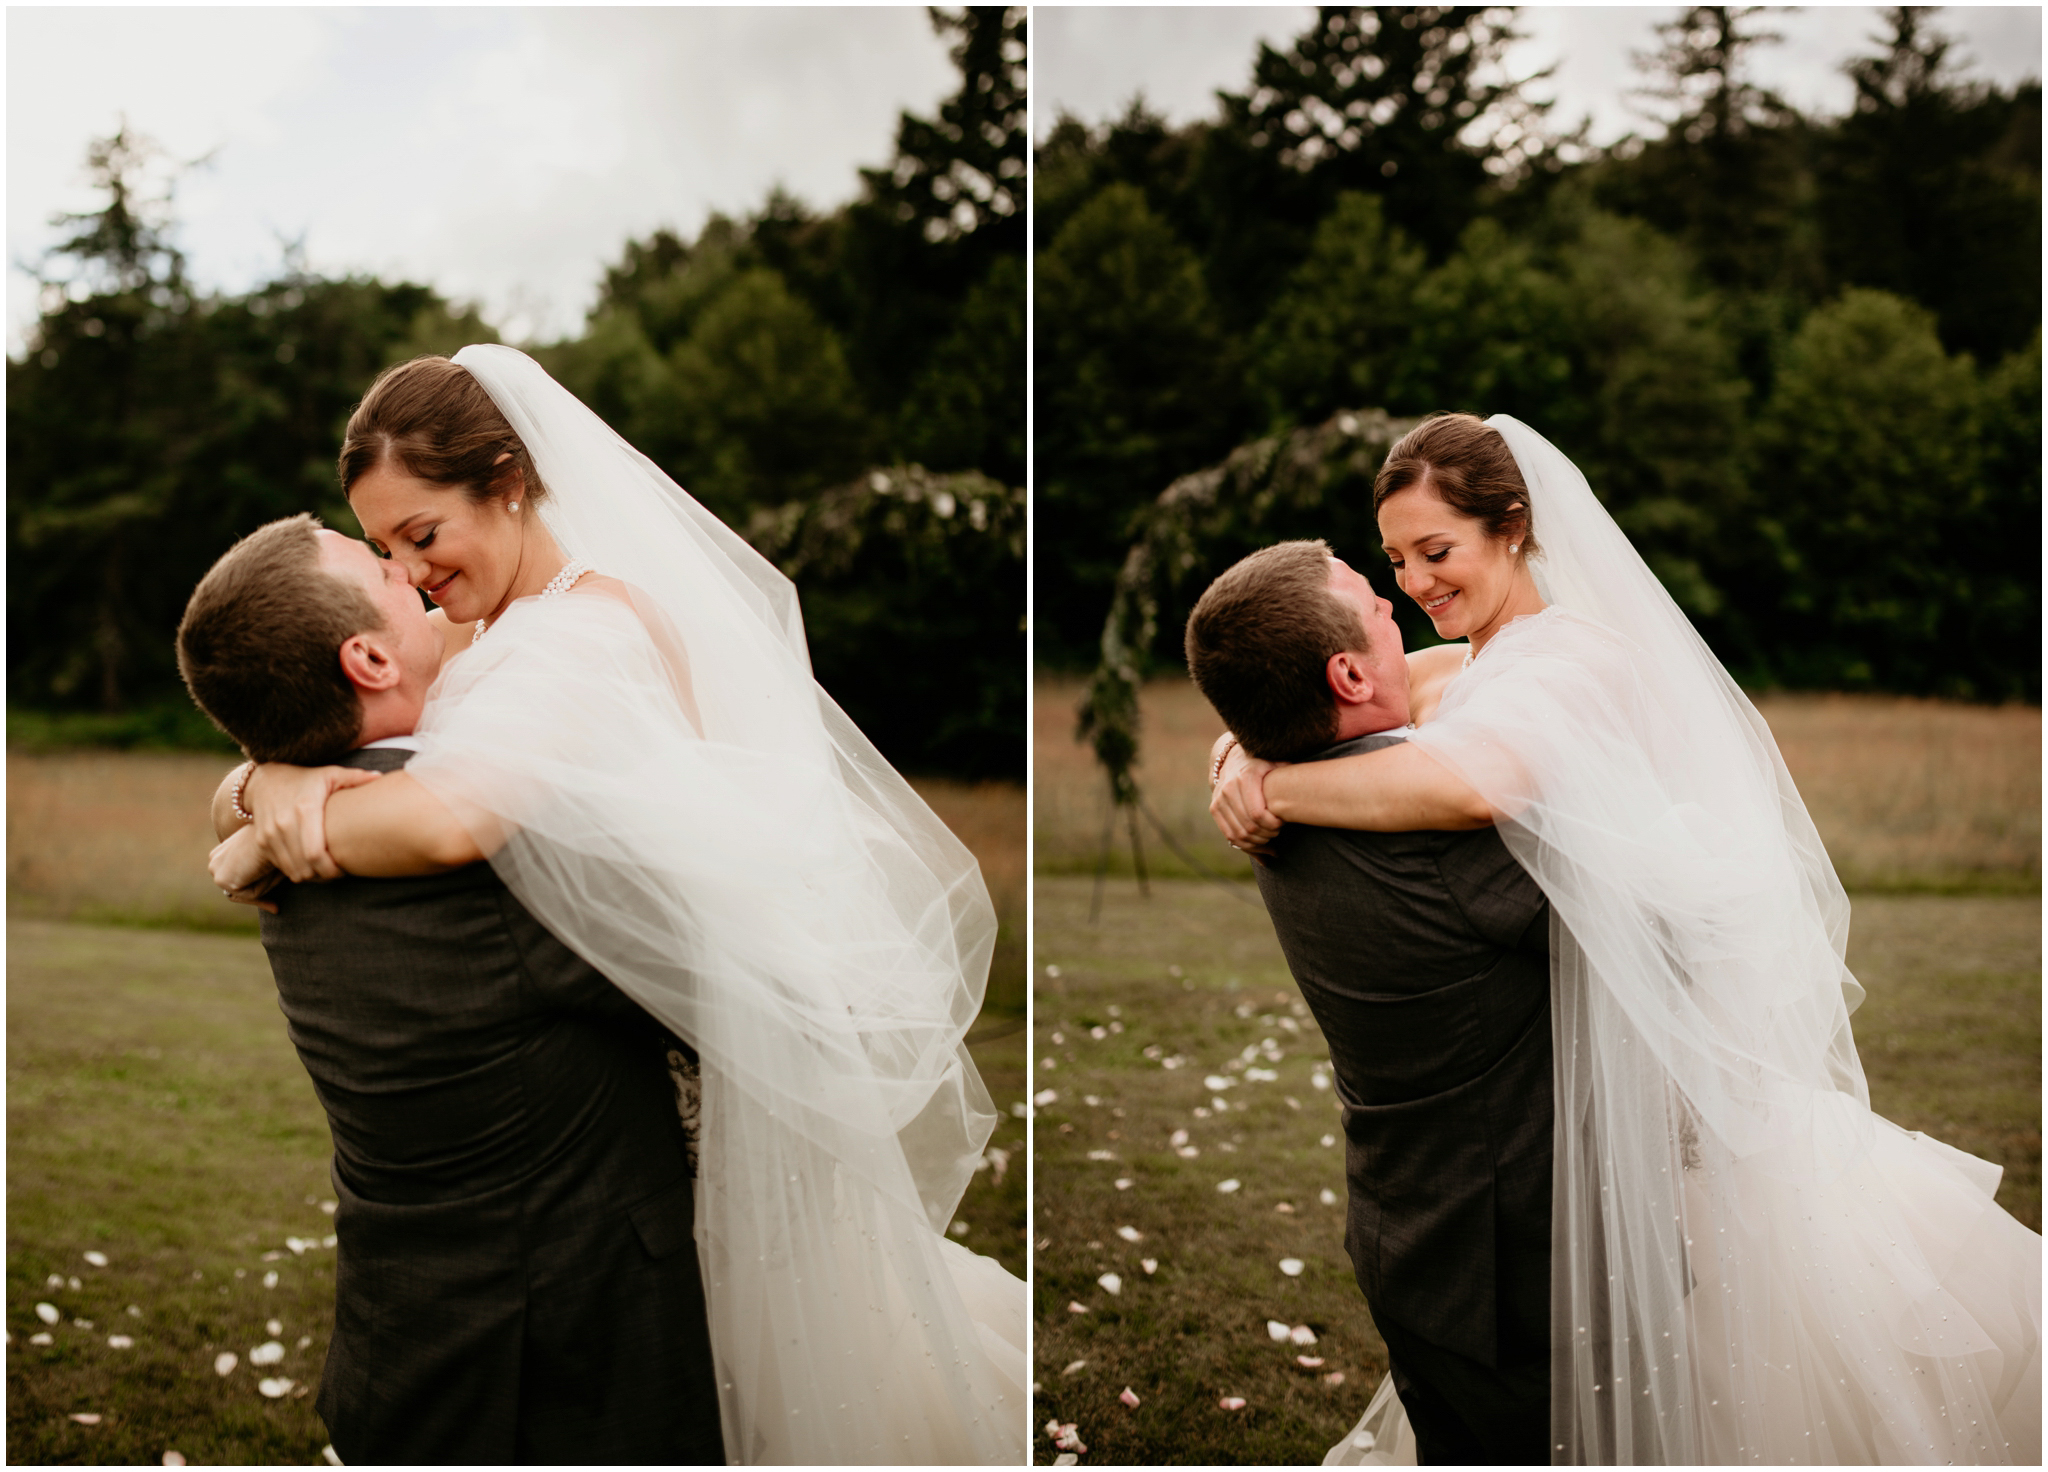 alex-and-matthew-three-cs-farm-venue-seattle-wedding-photographer-141.jpg